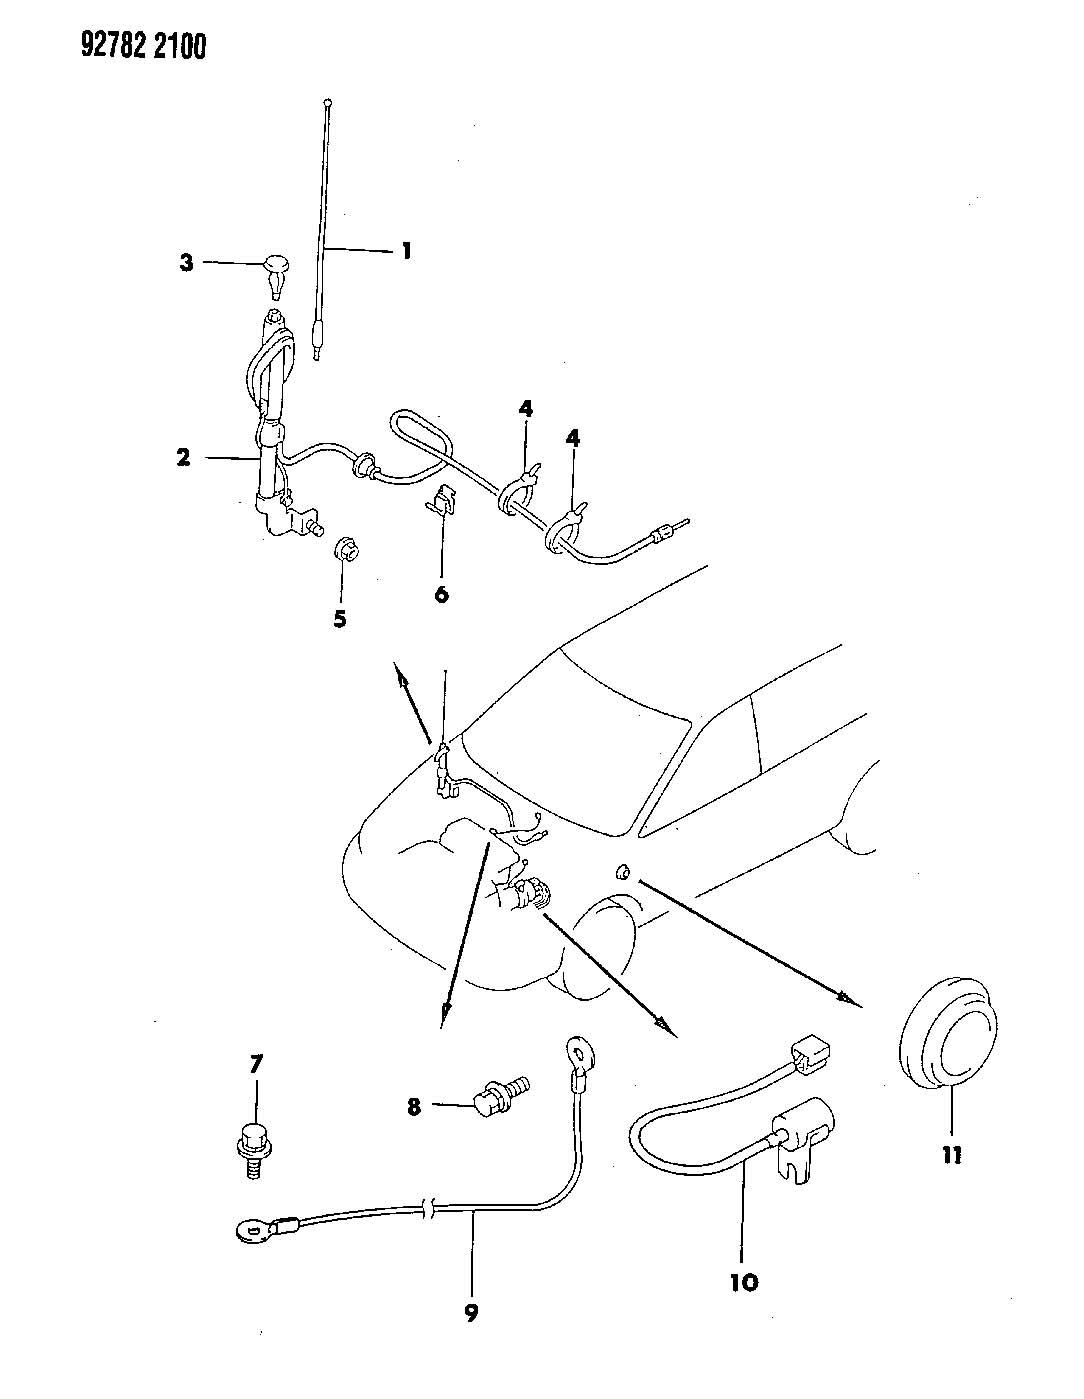 1999 Chrysler Sebring Clip. Antenna. (5.4). Insulators